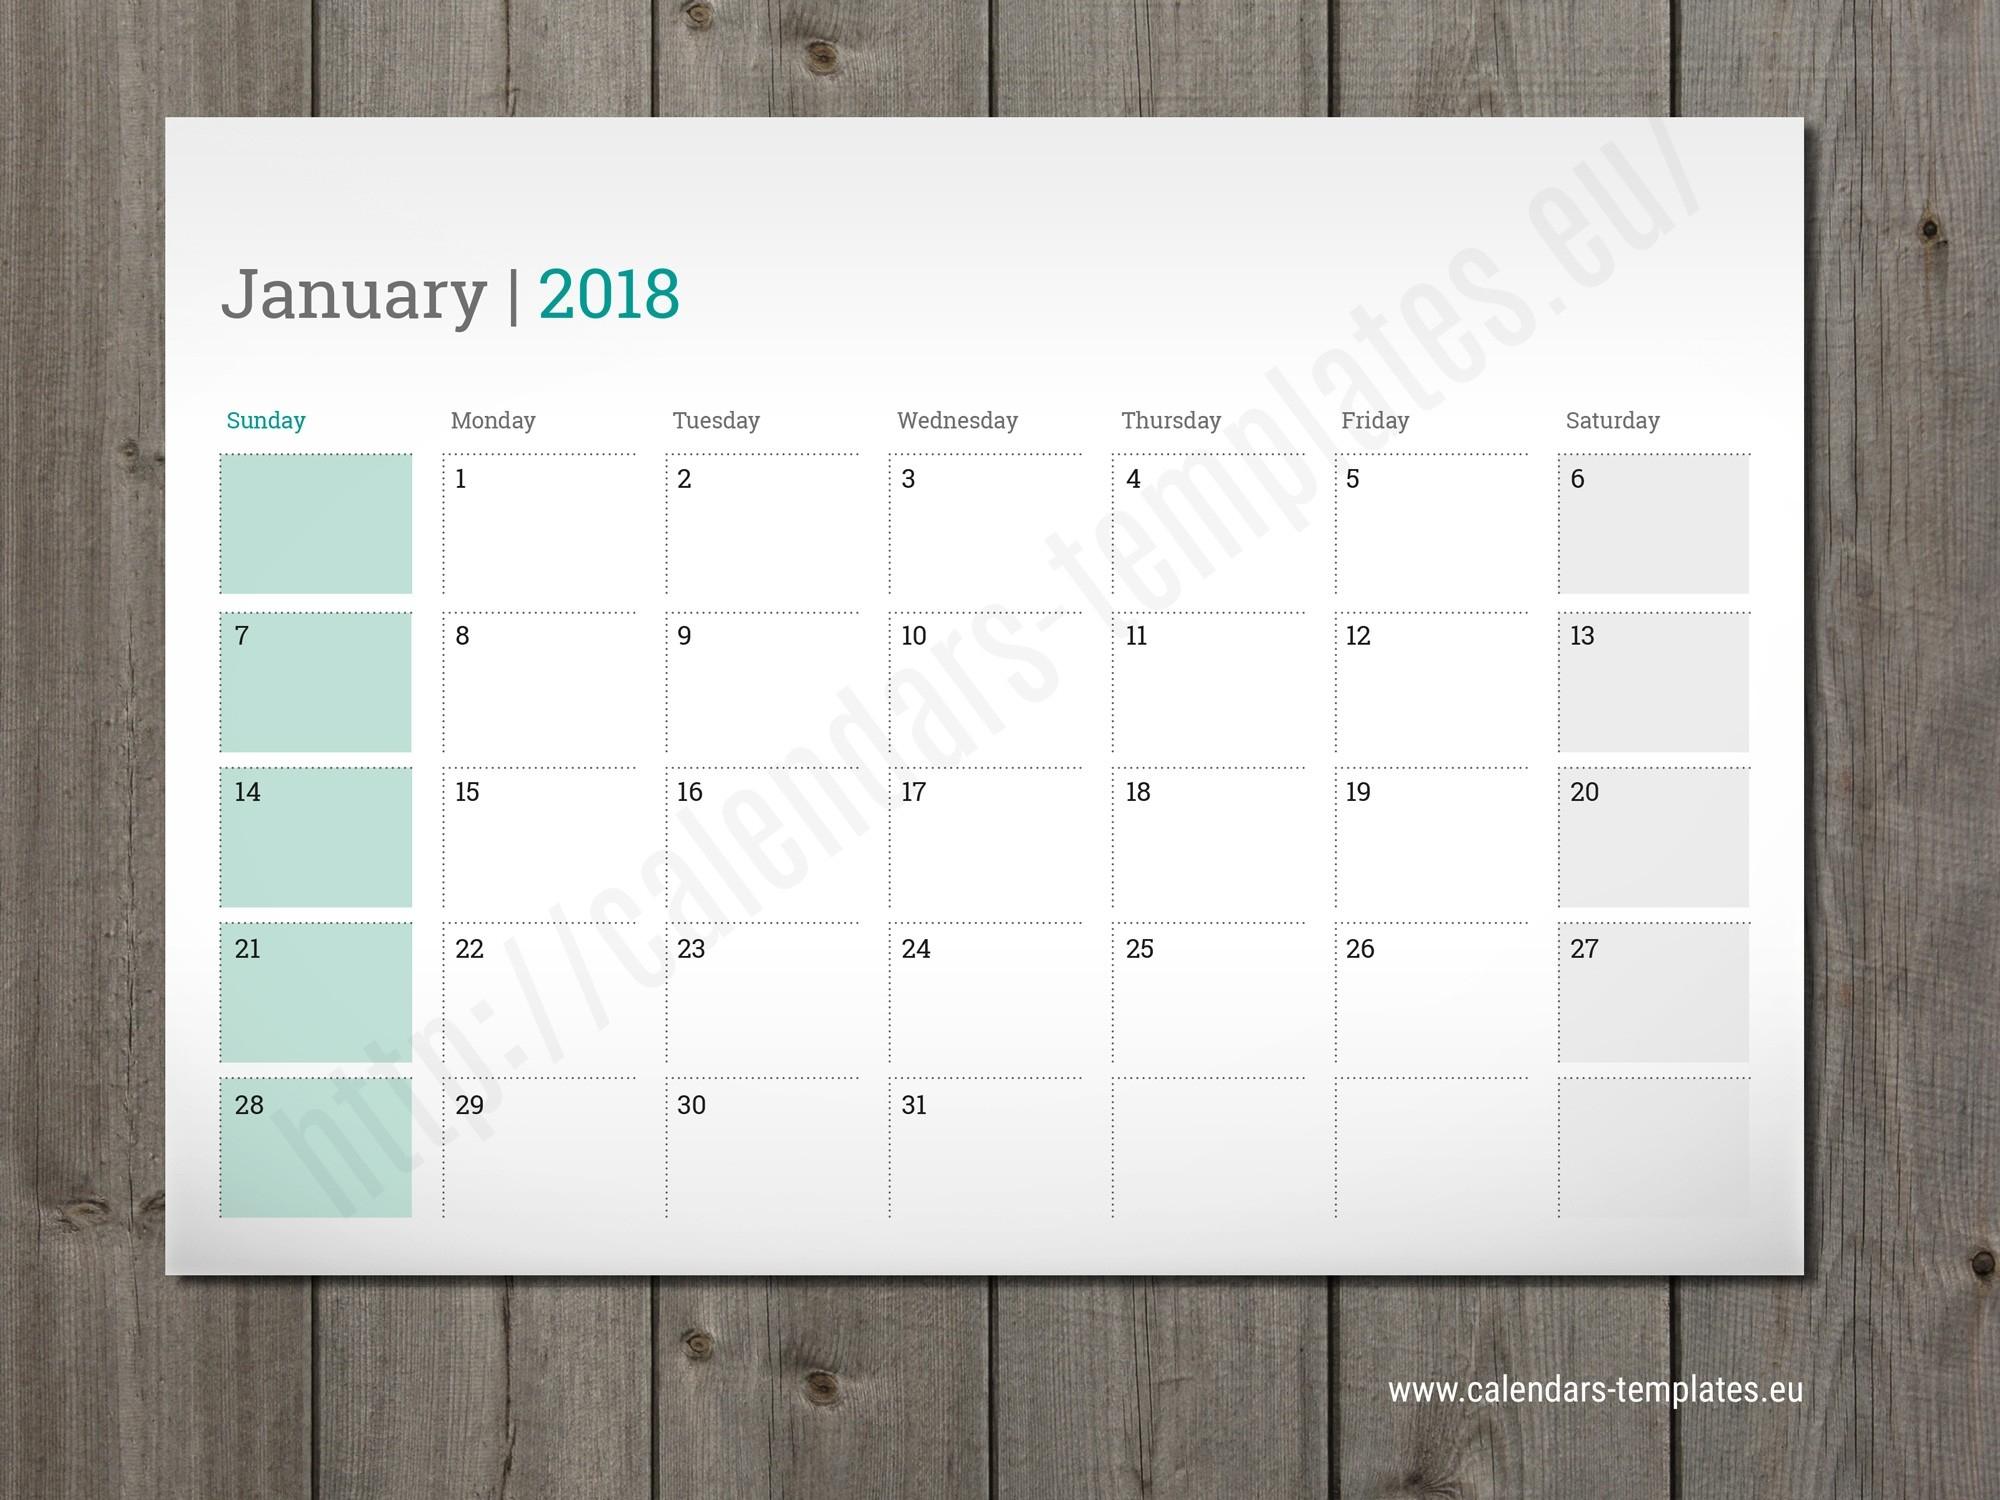 Template Calendar 2018 Indesign | Printable Calendar 2019-Calendar Template Indesign Free